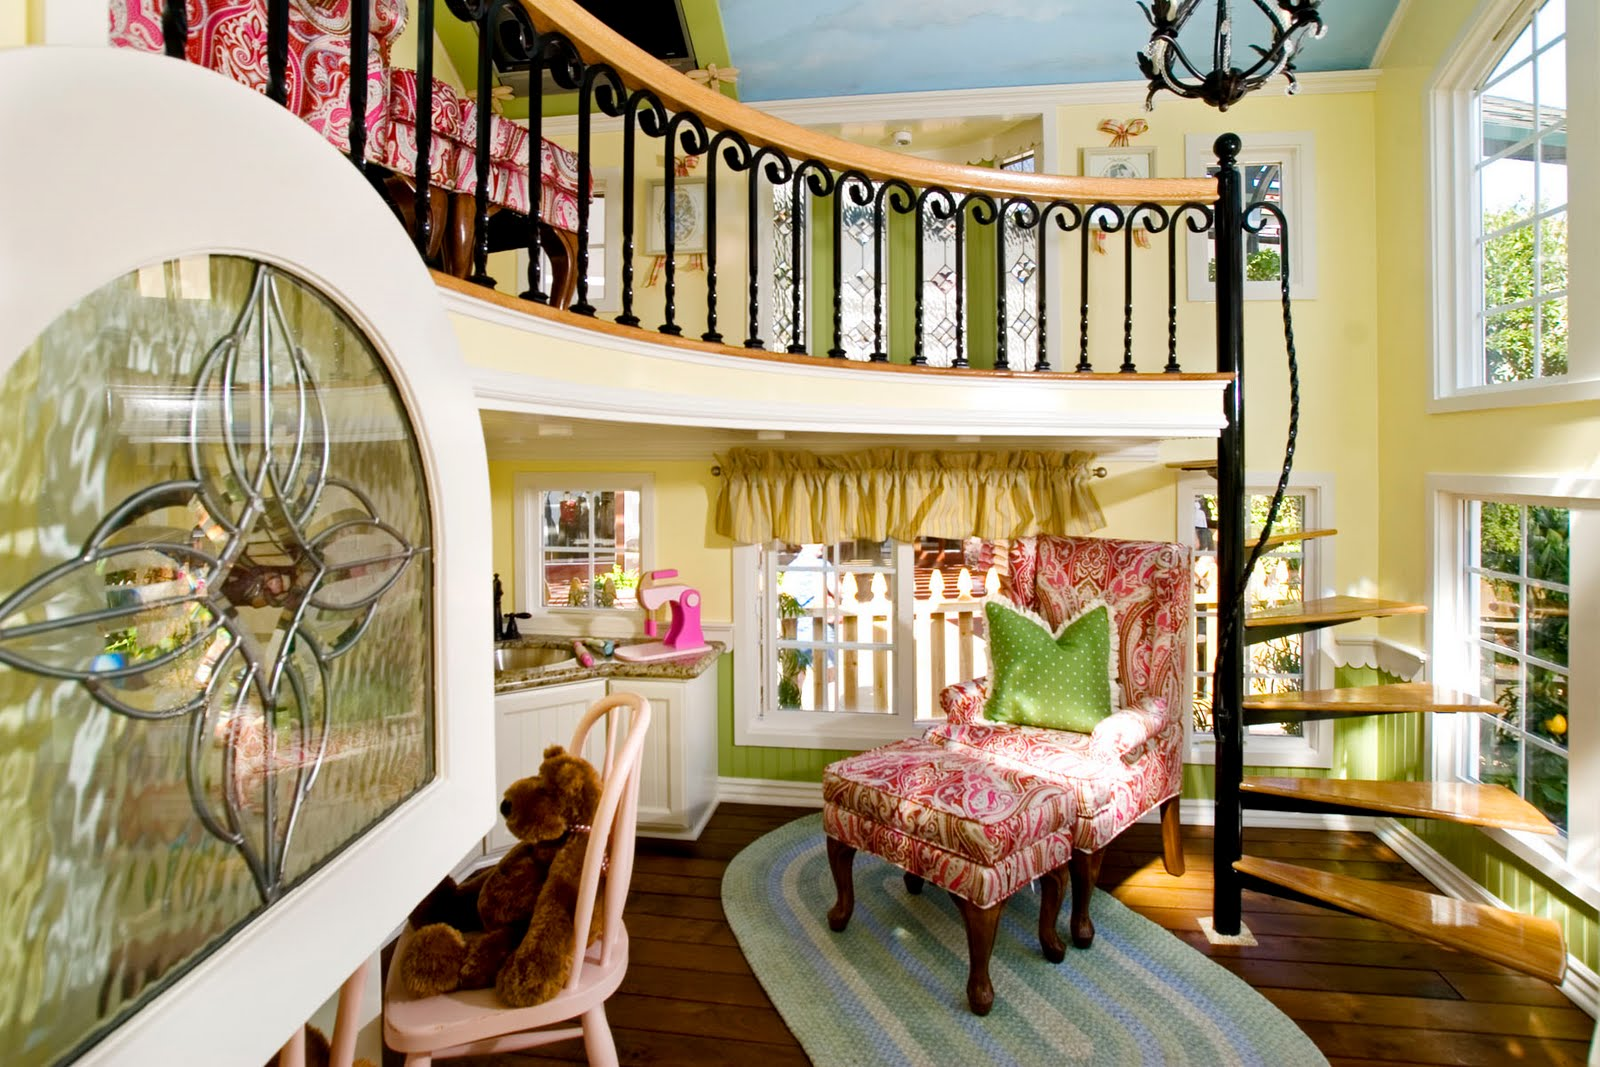 playhouse child friendly interior surfaces | Woodwork Playhouse Interior Design PDF Plans